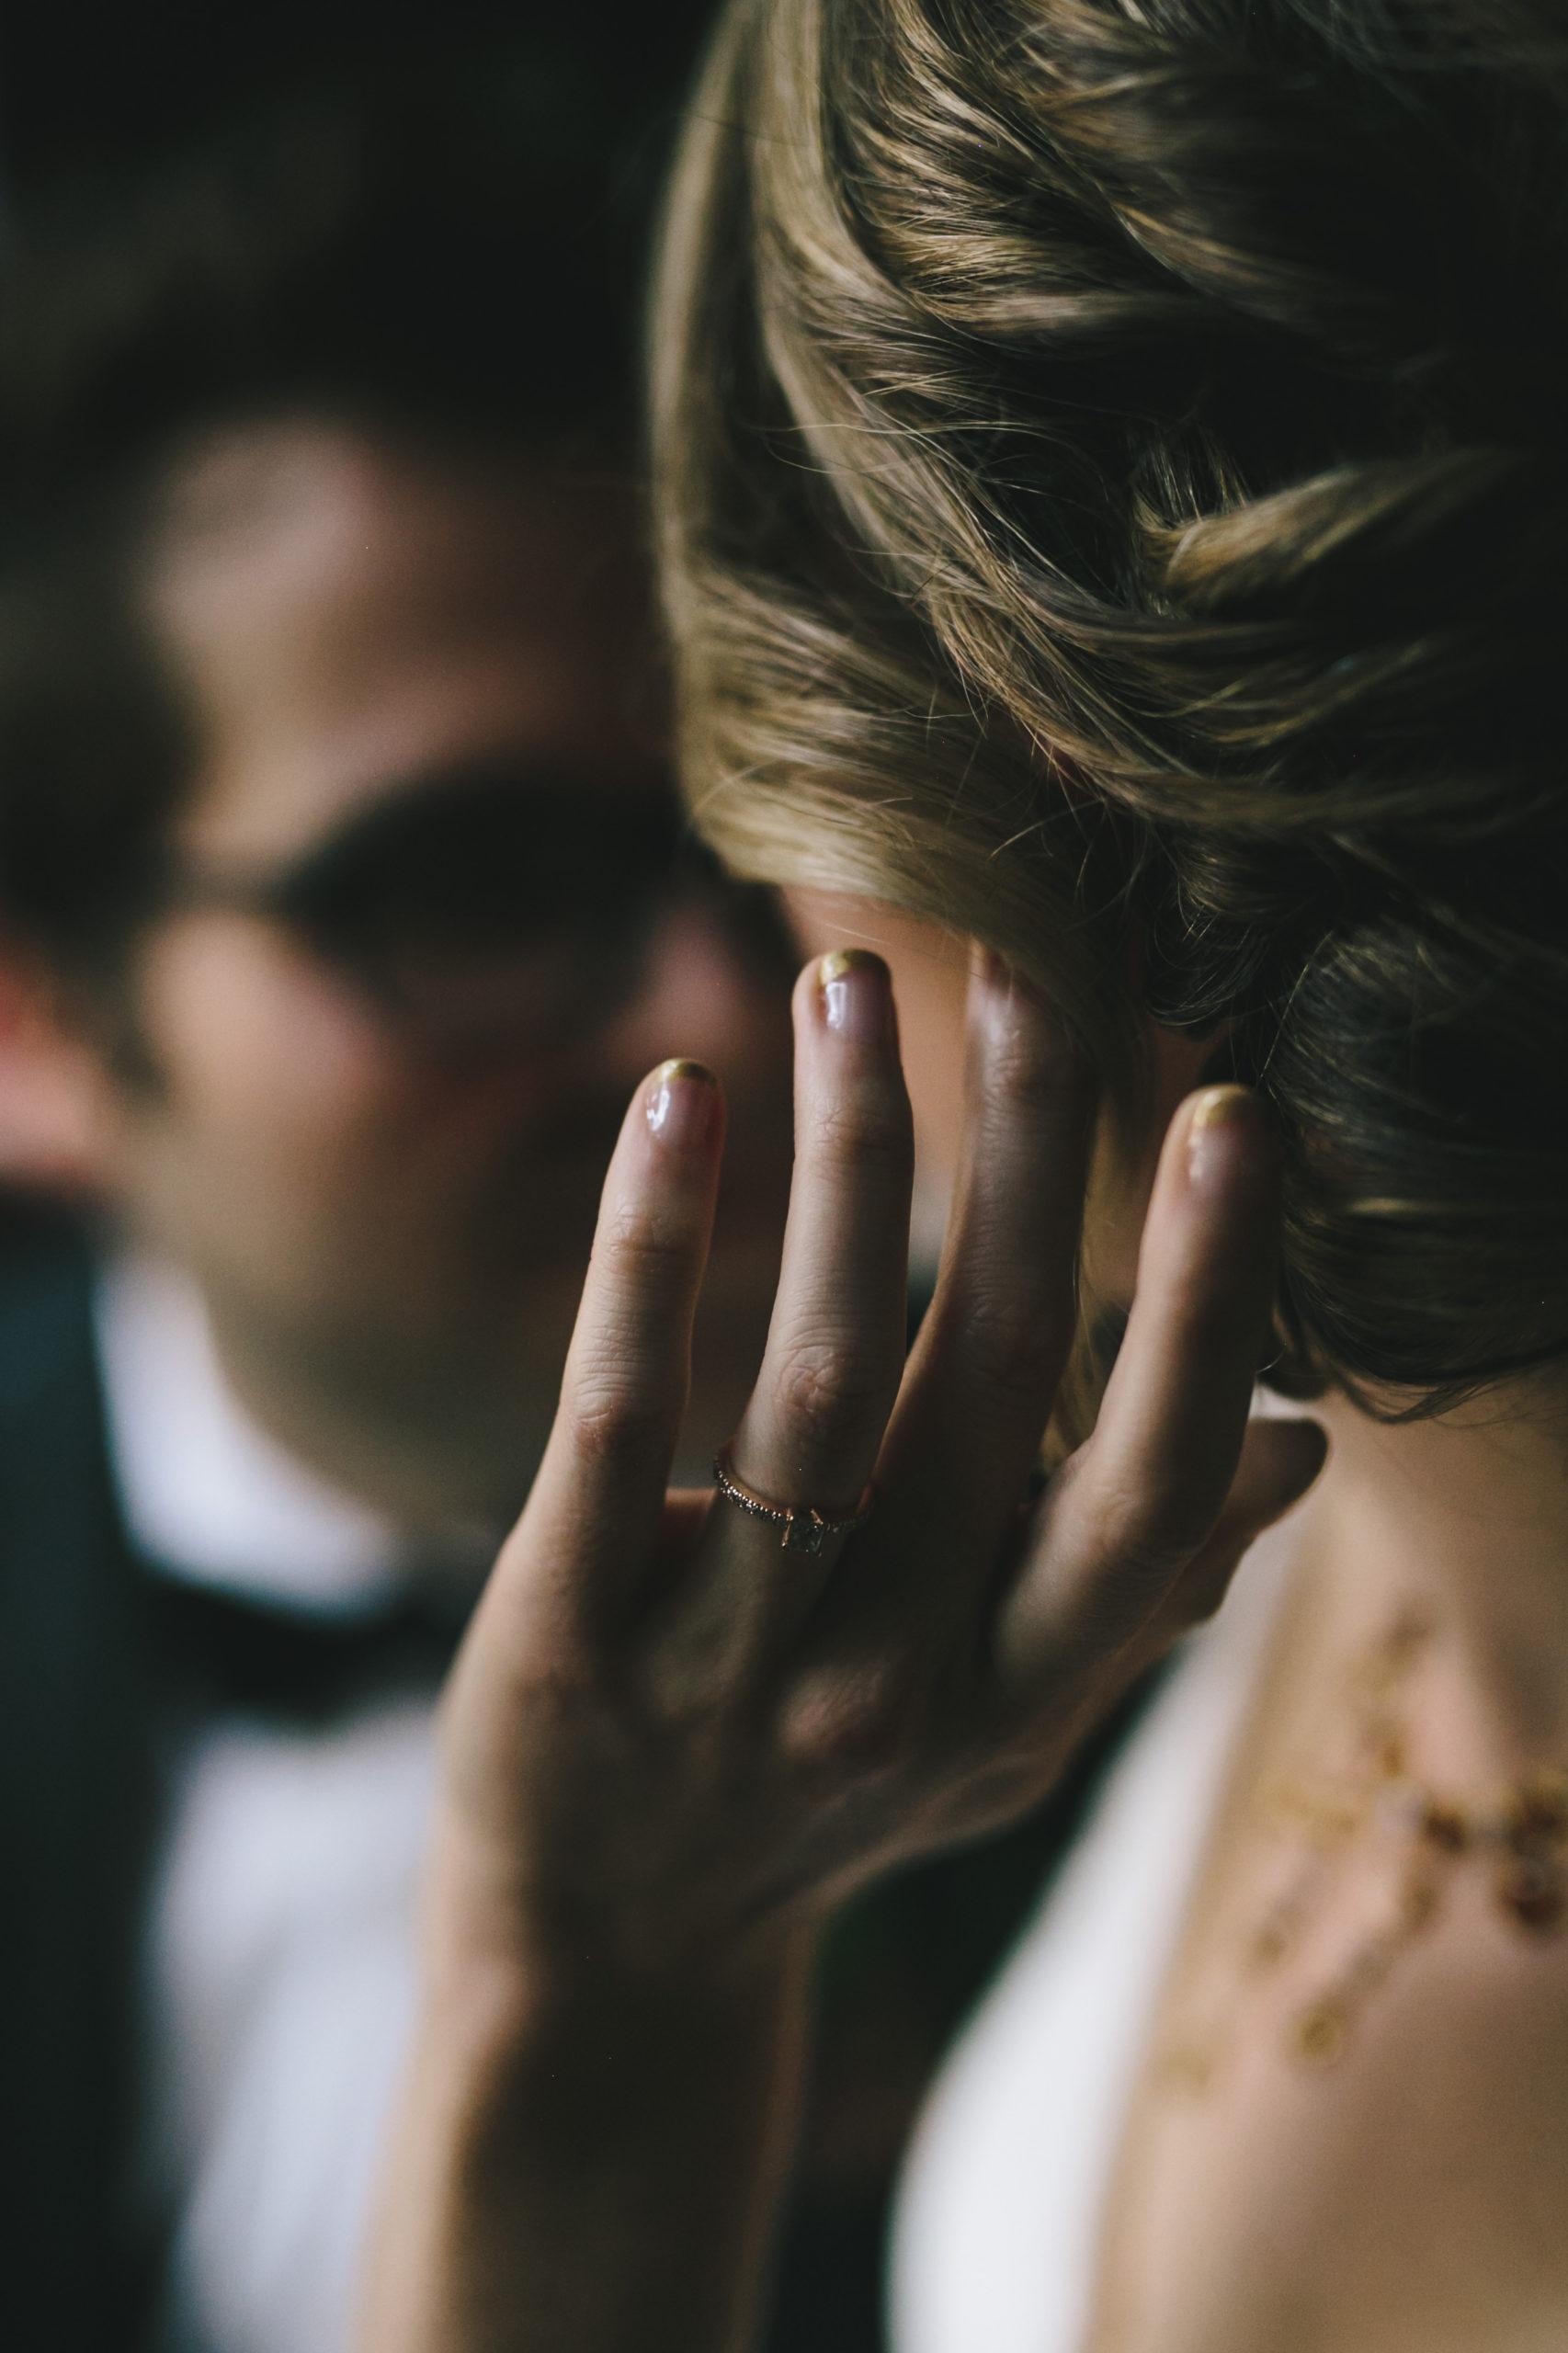 Bride shows off vintage wedding ring